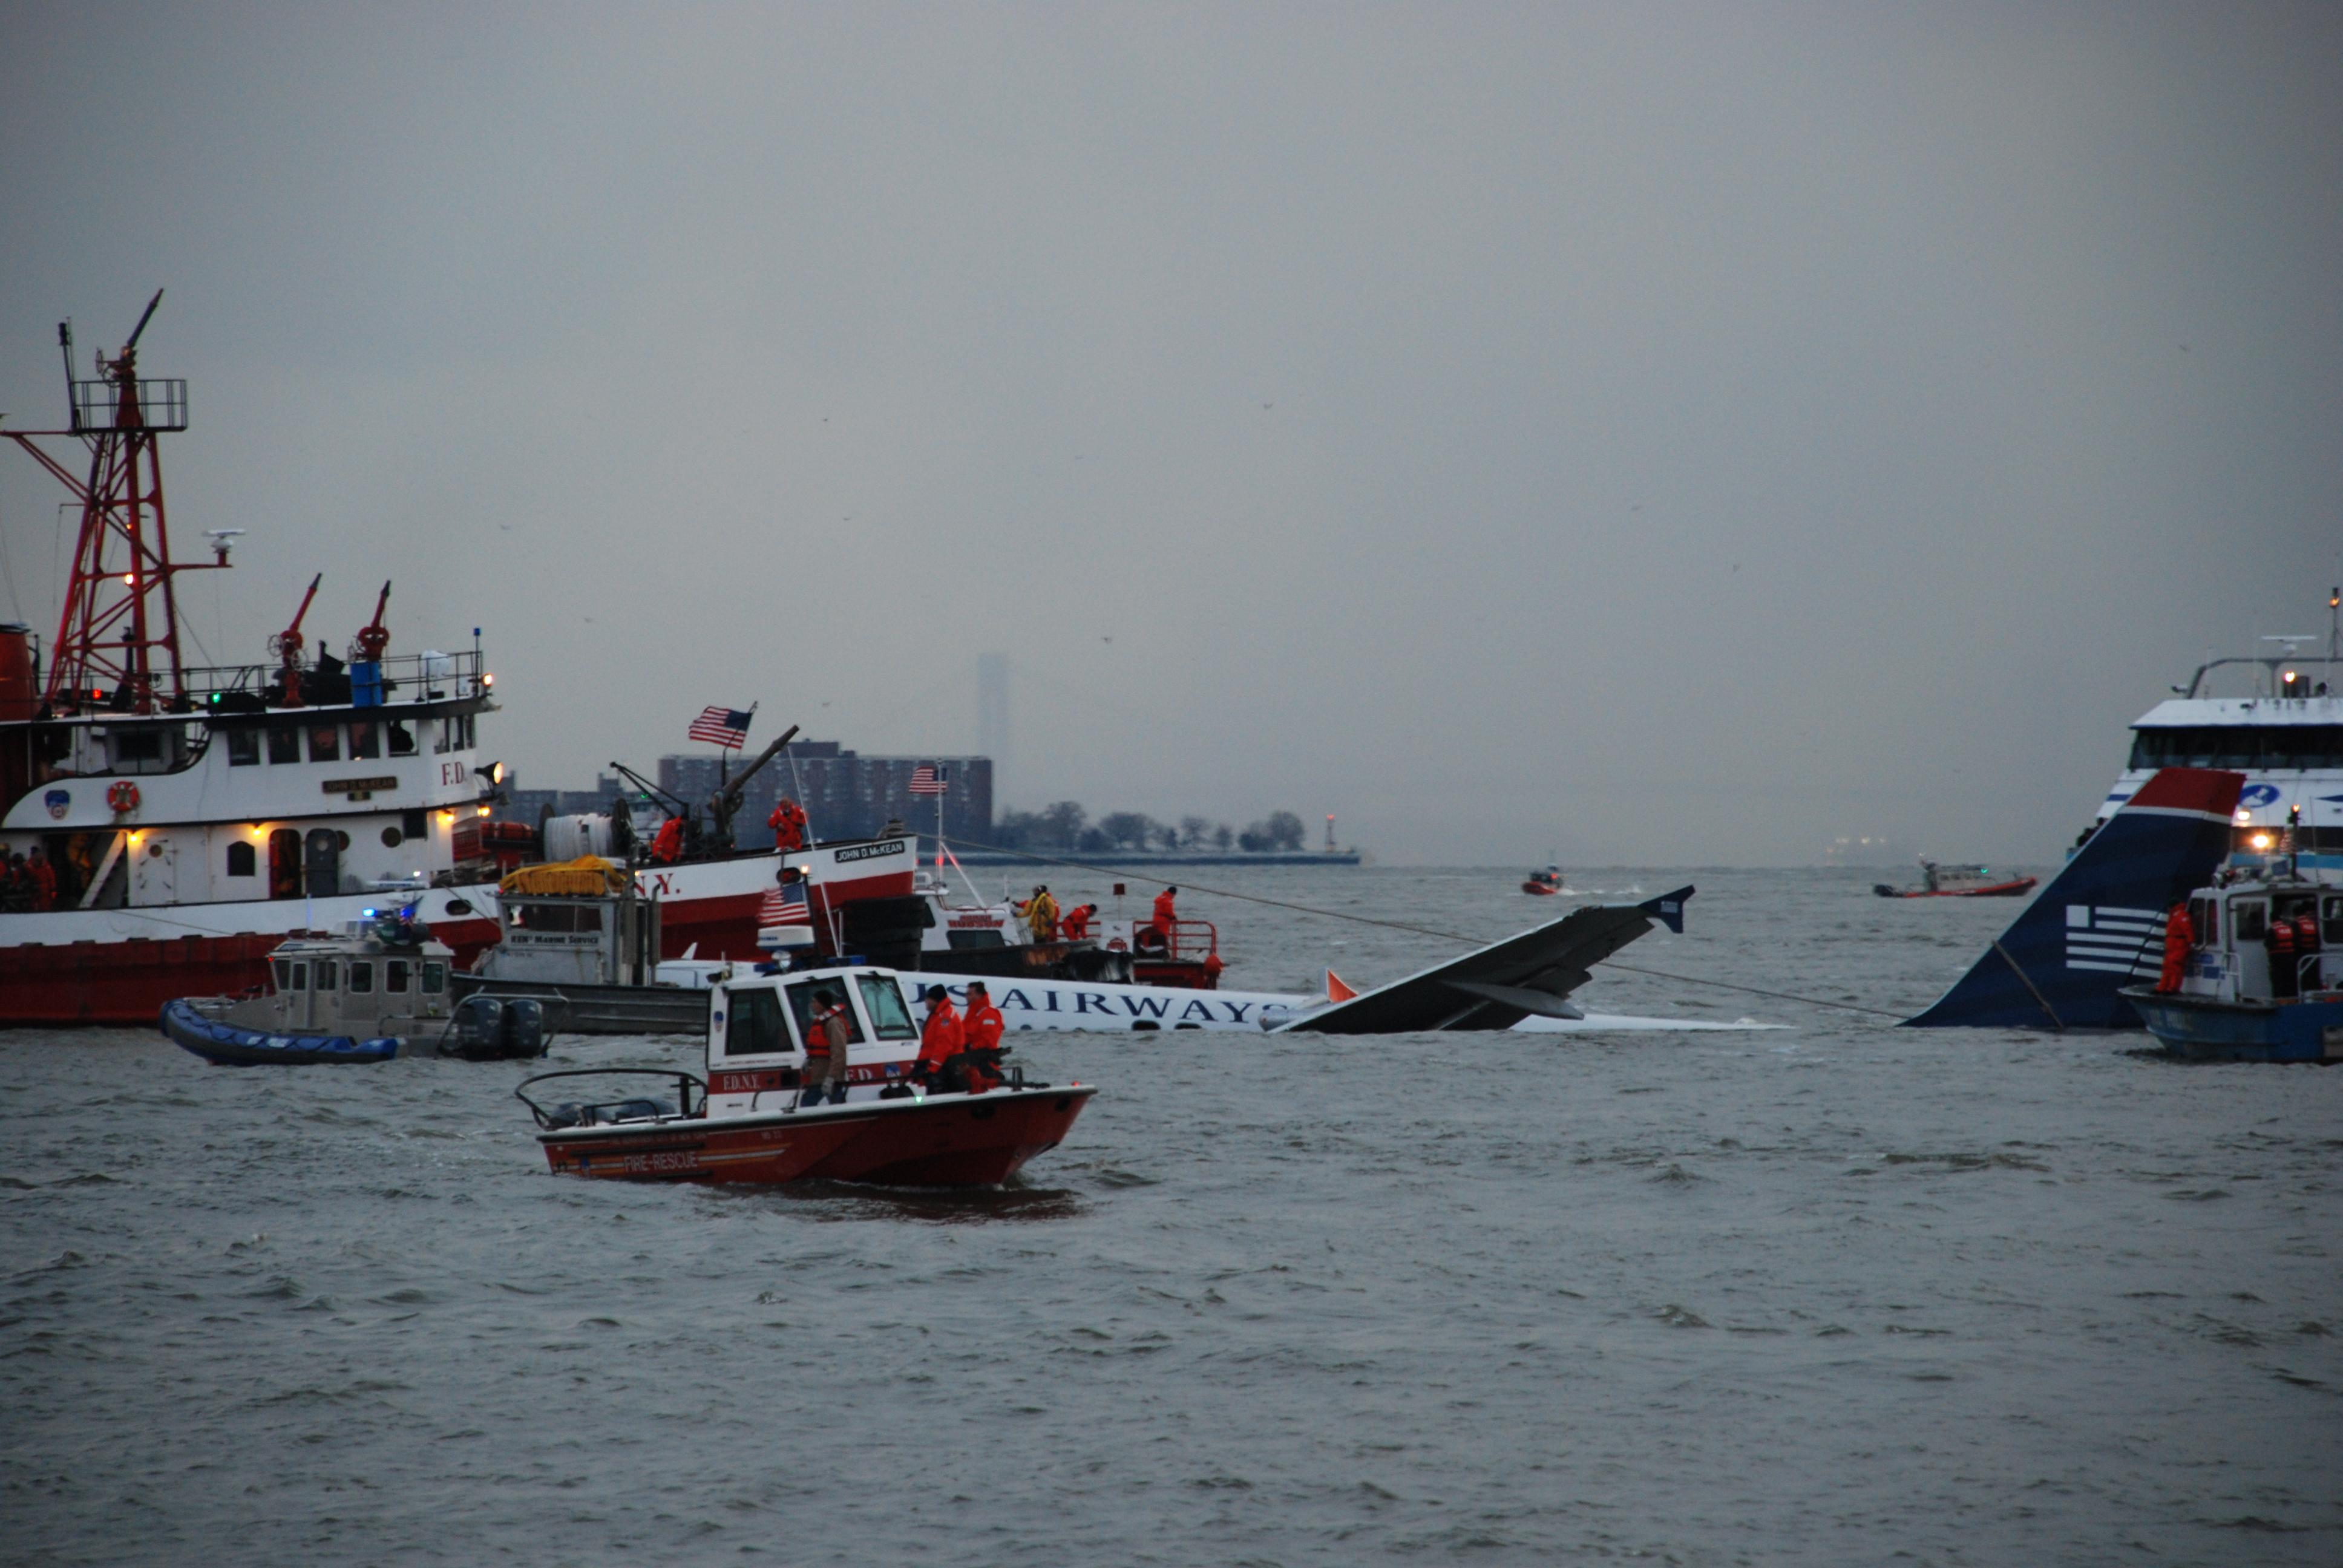 File:US Air Flight 1549 rescue efforts.jpg